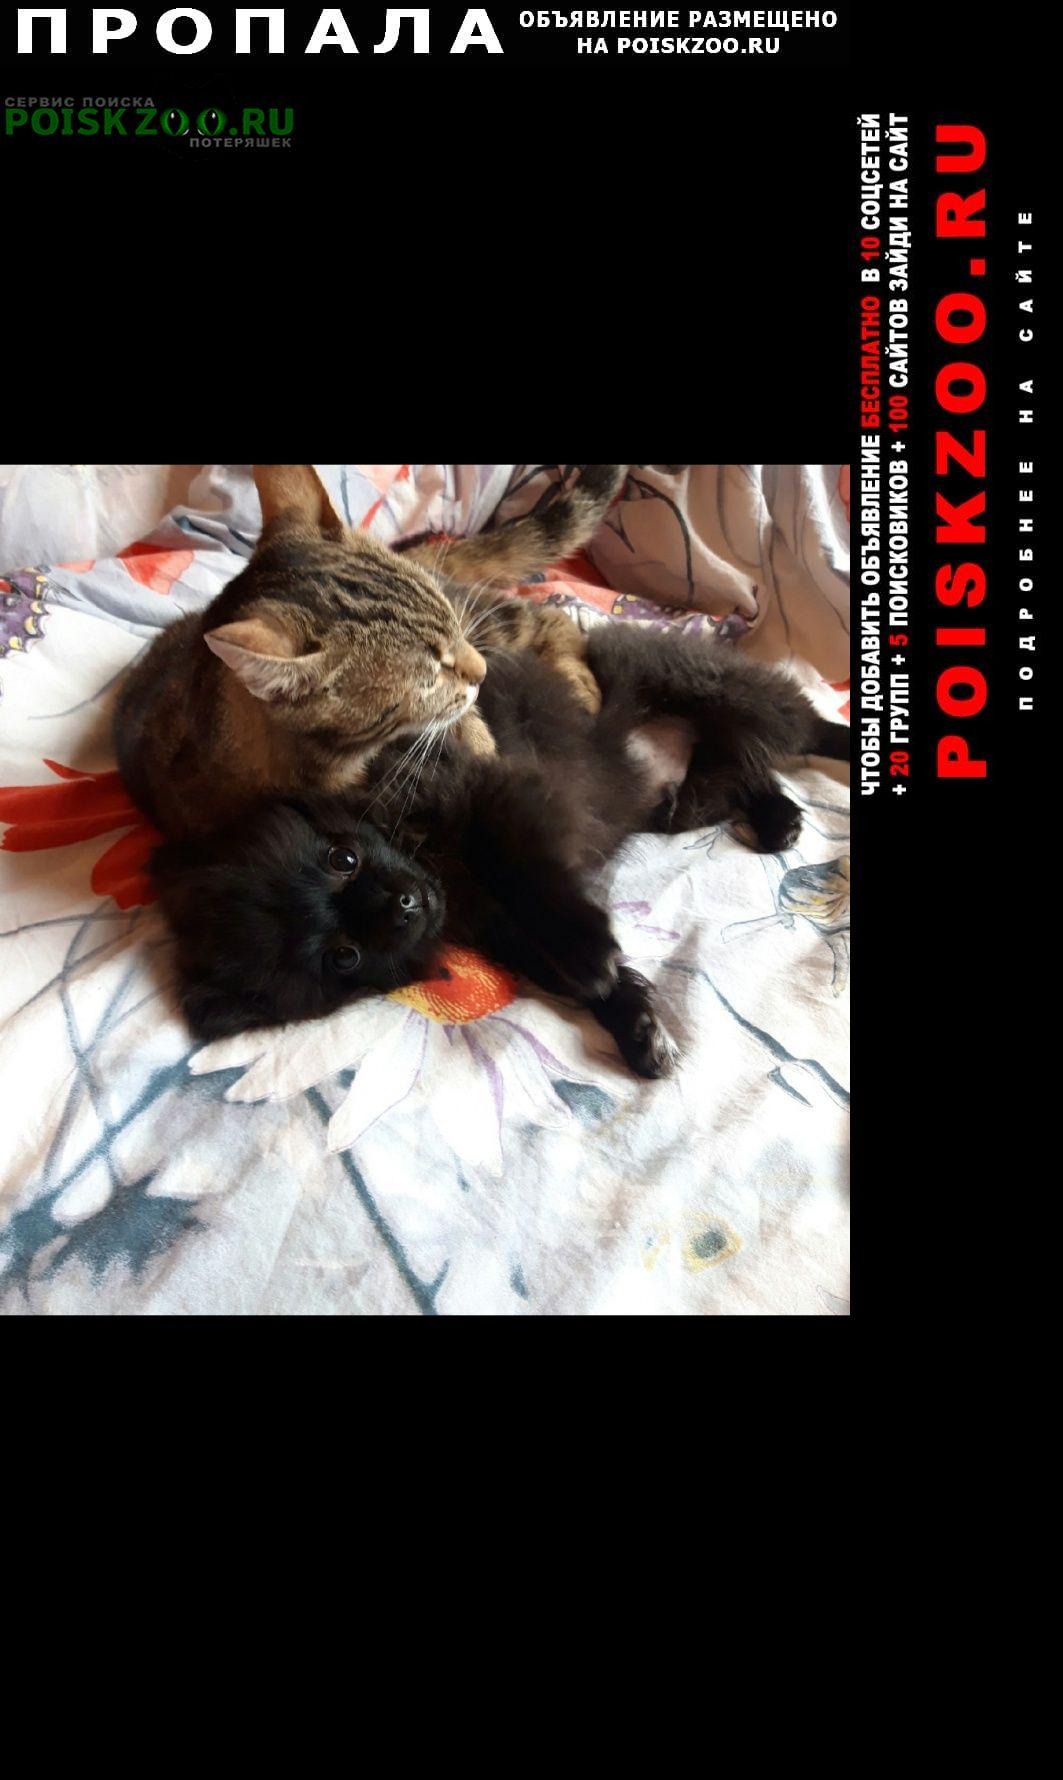 Пропала собака кобель помогите Санкт-Петербург